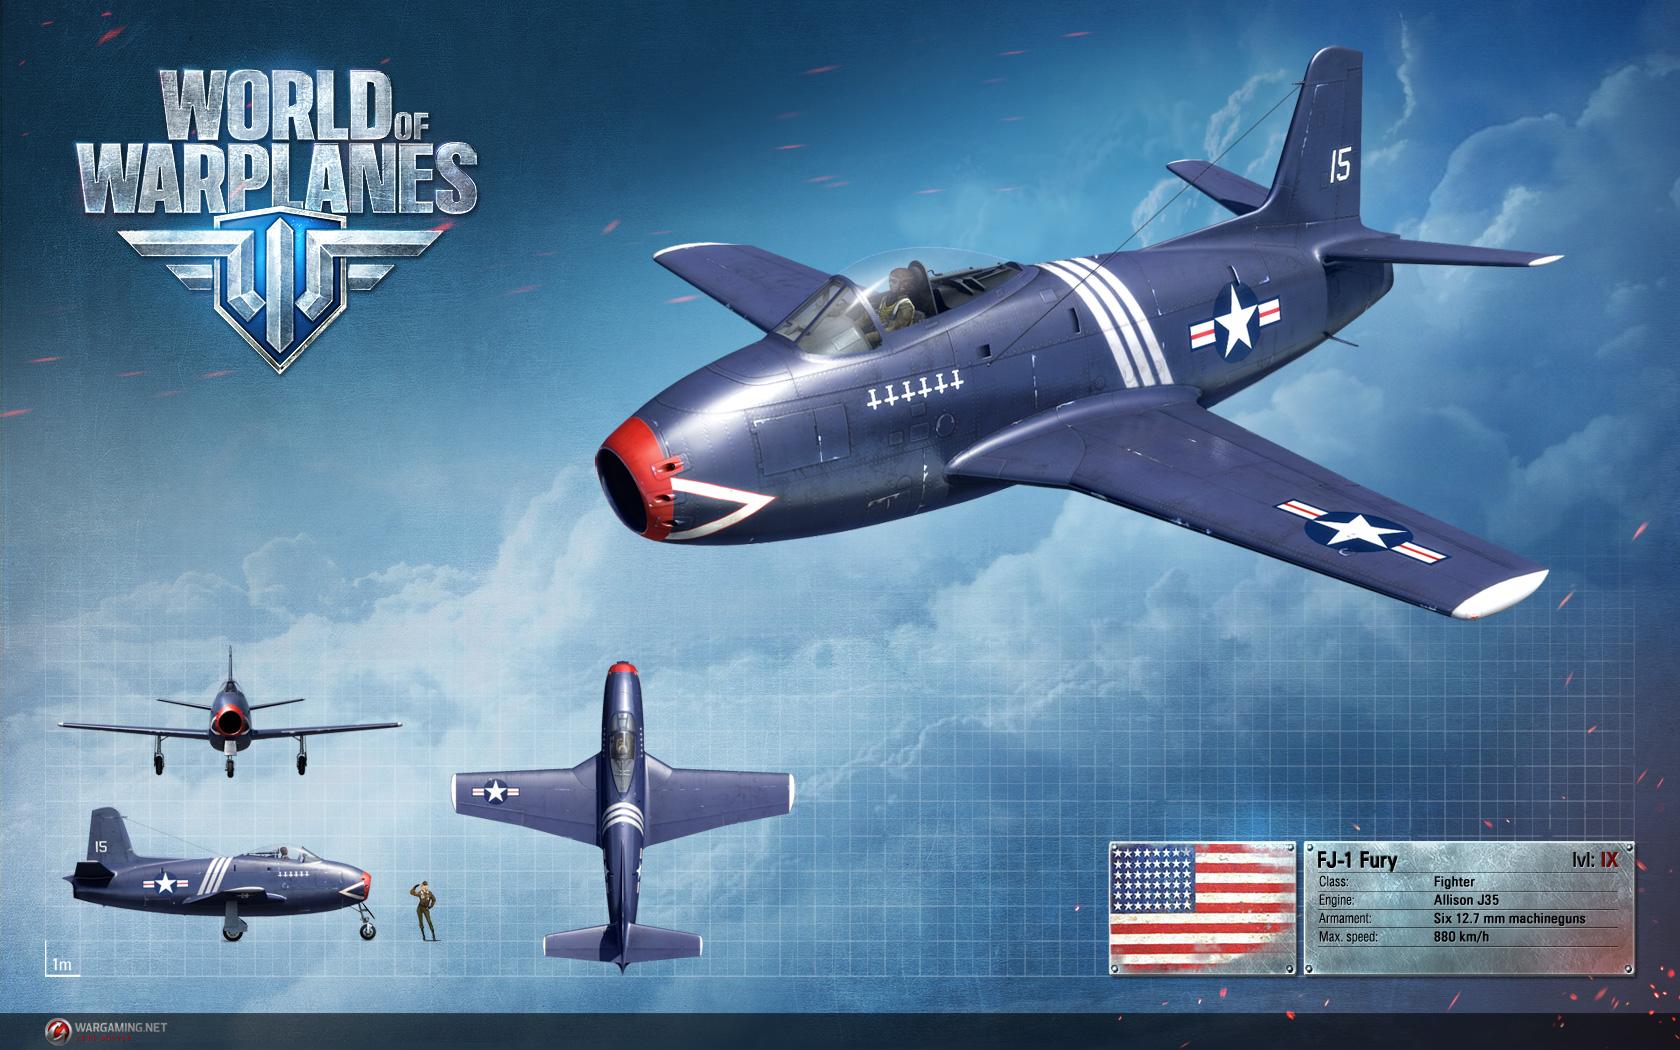 North American FJ-1 Fury